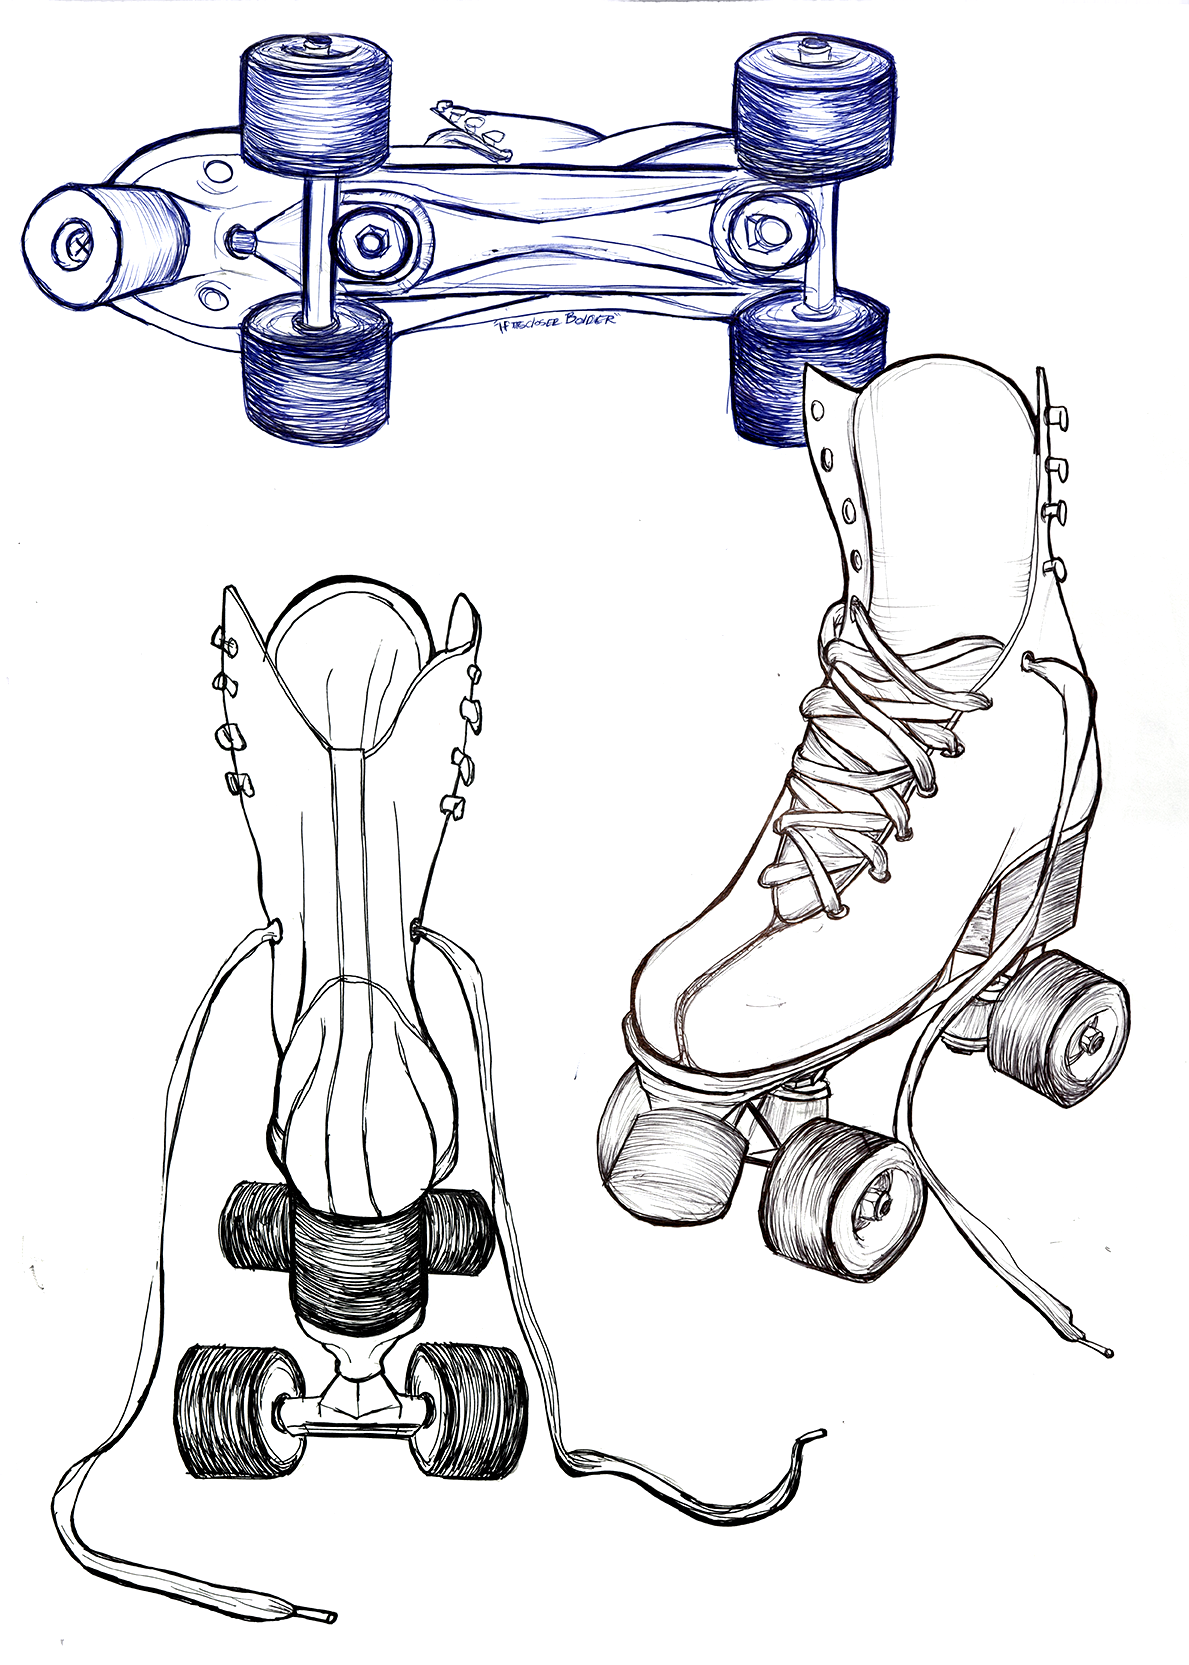 tool-drawing-2.png